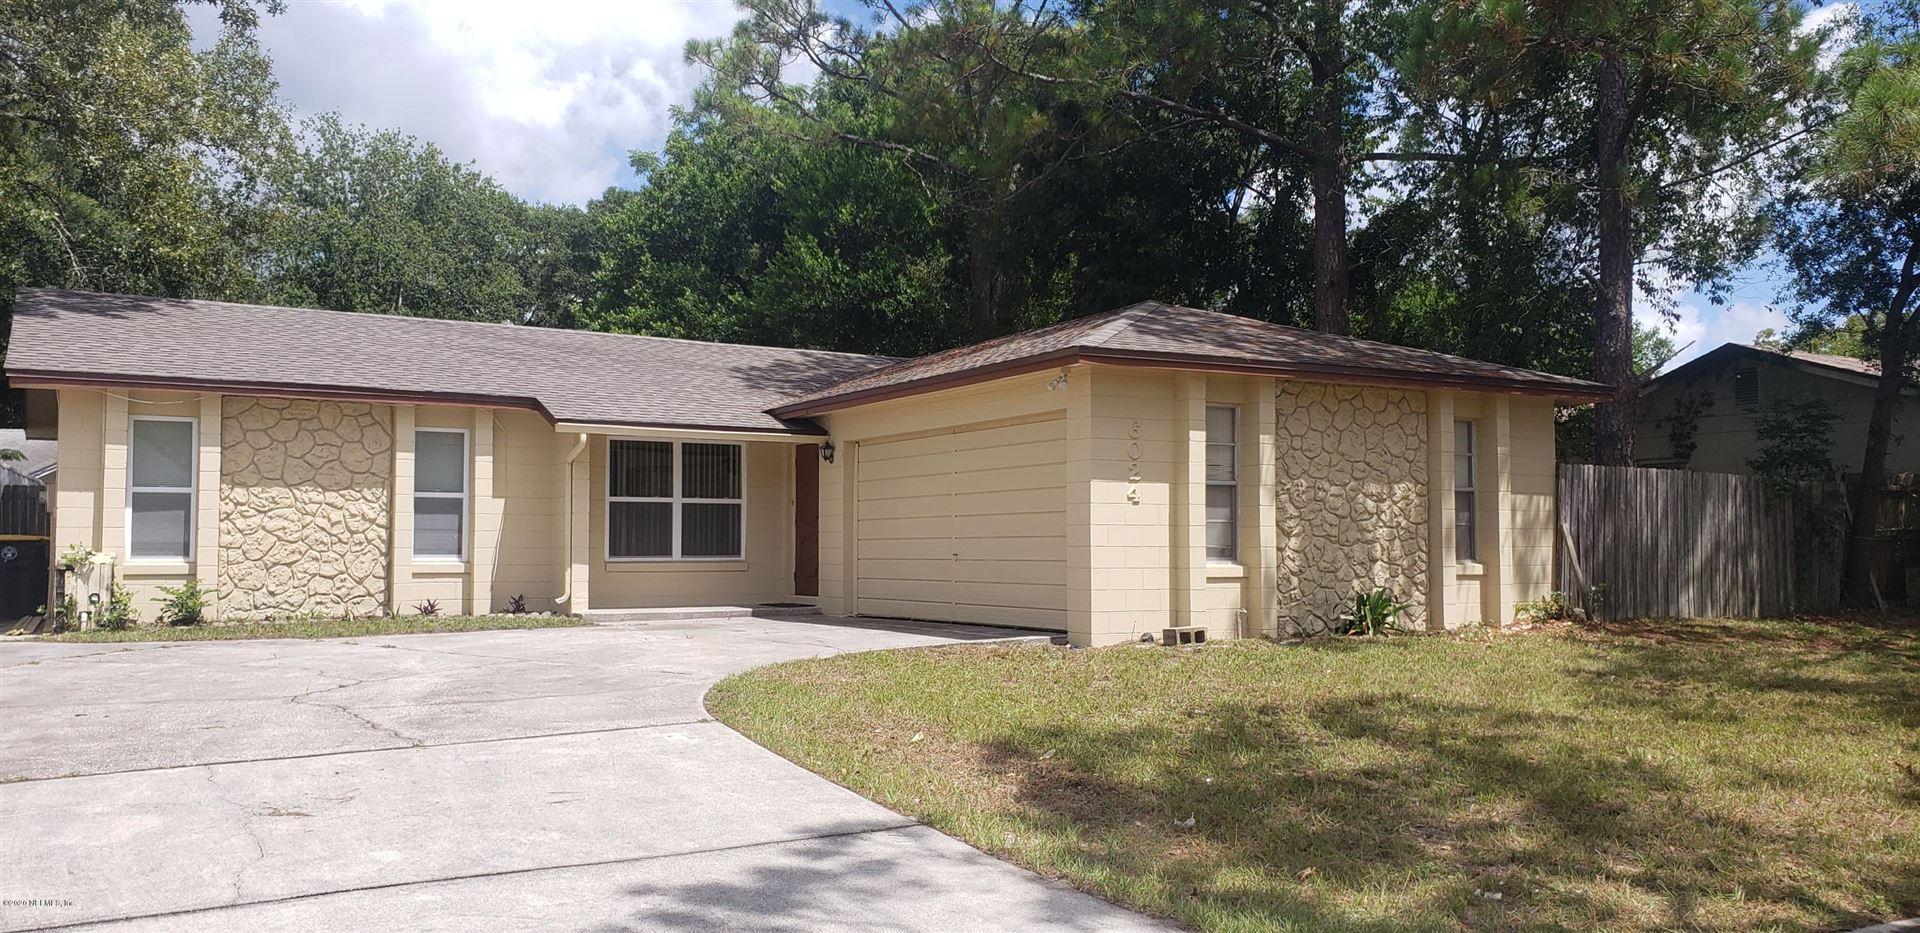 6024 JAGUAR DR W, Jacksonville, FL 32244 - MLS#: 1064878